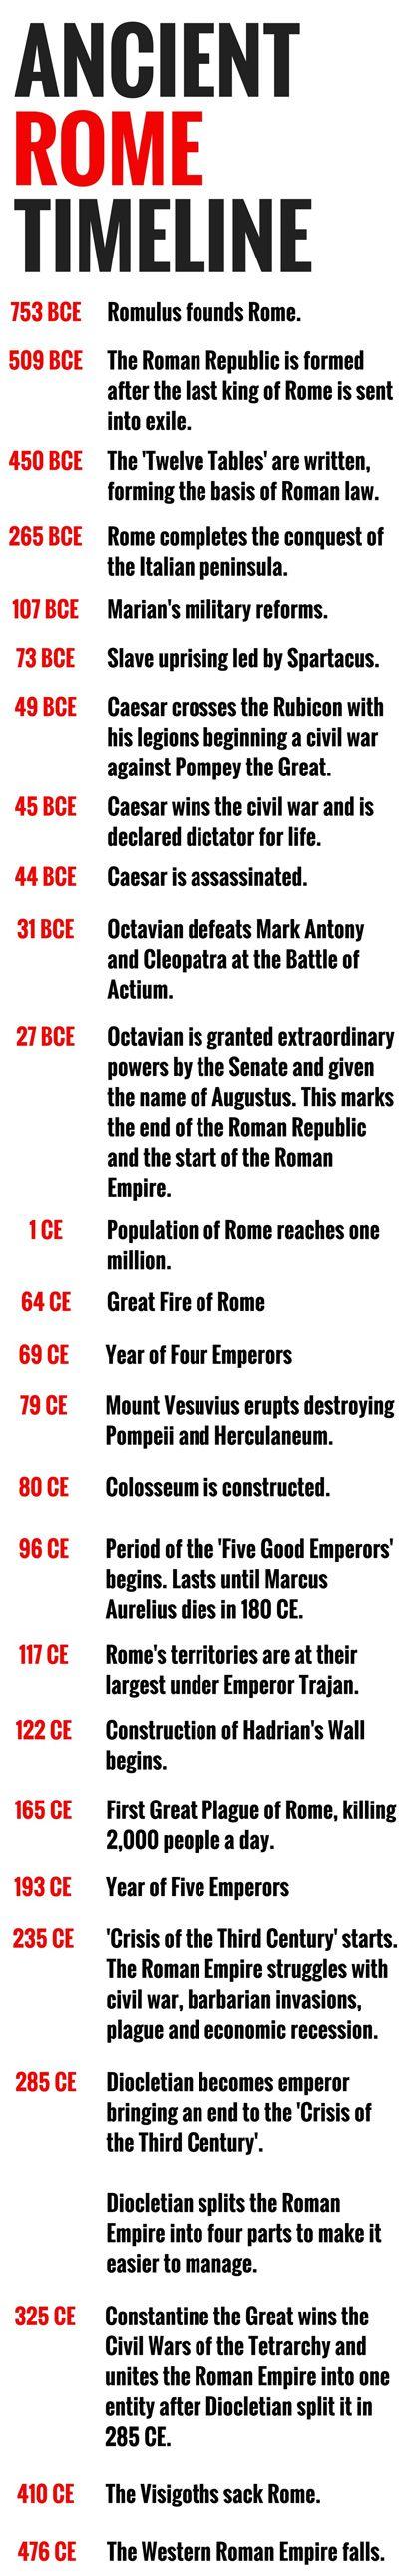 ancient rome development pax romana - photo#26